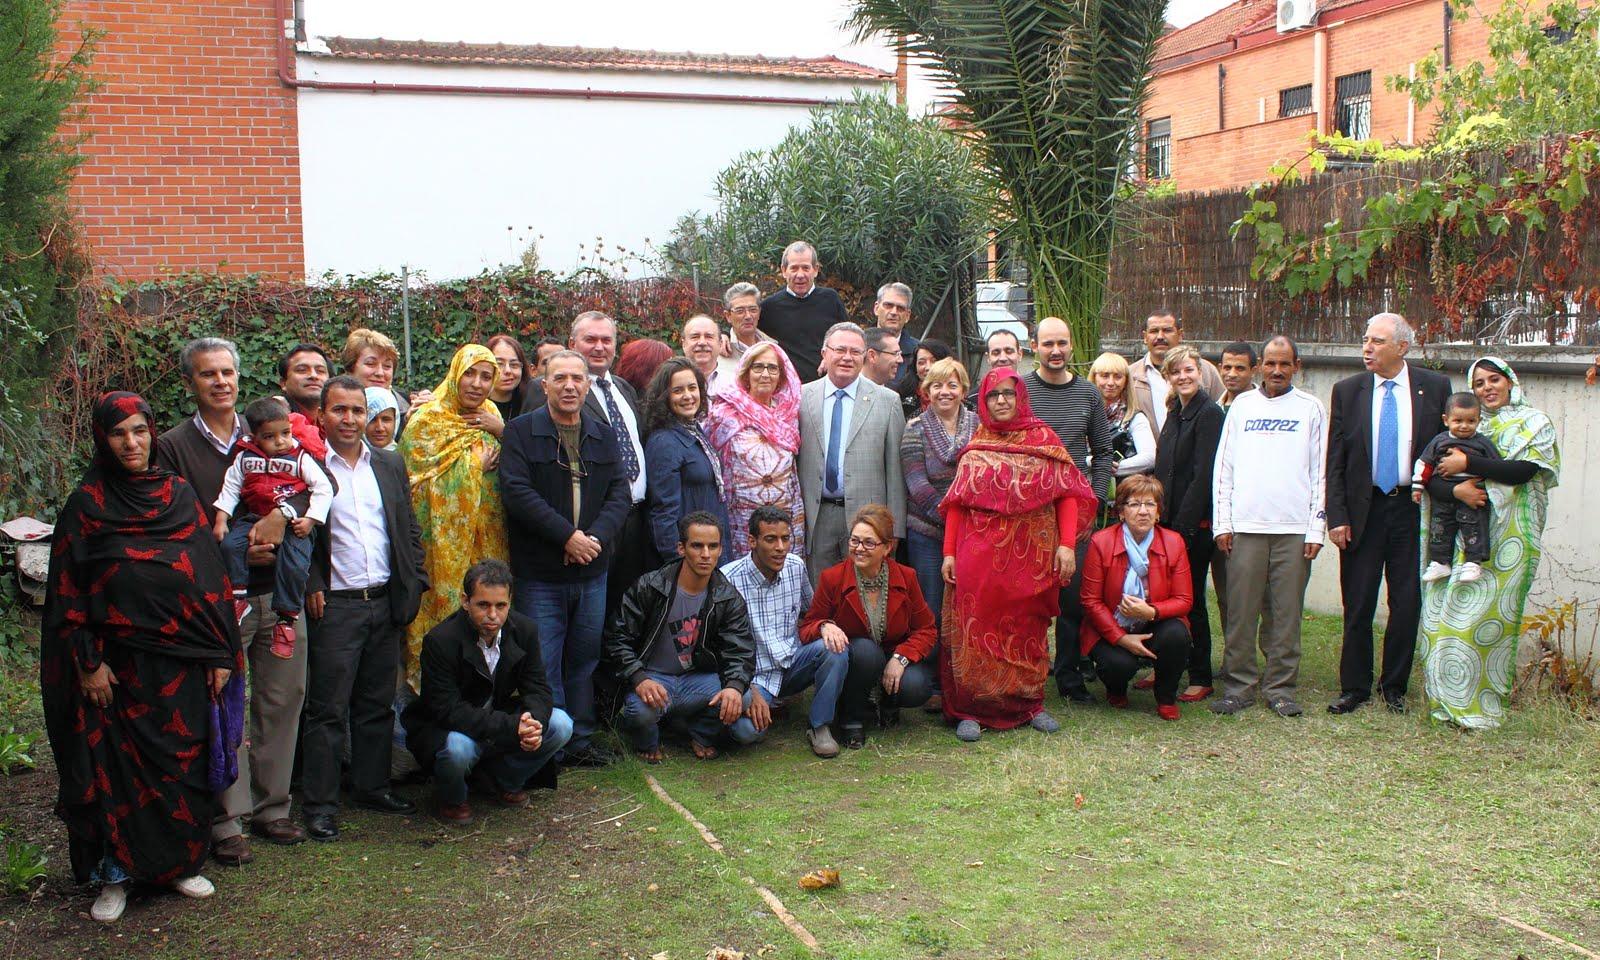 Getafe Fin De Fiesta: Blog De Cruz Roja En Getafe: Fiesta Del Cordero 2011